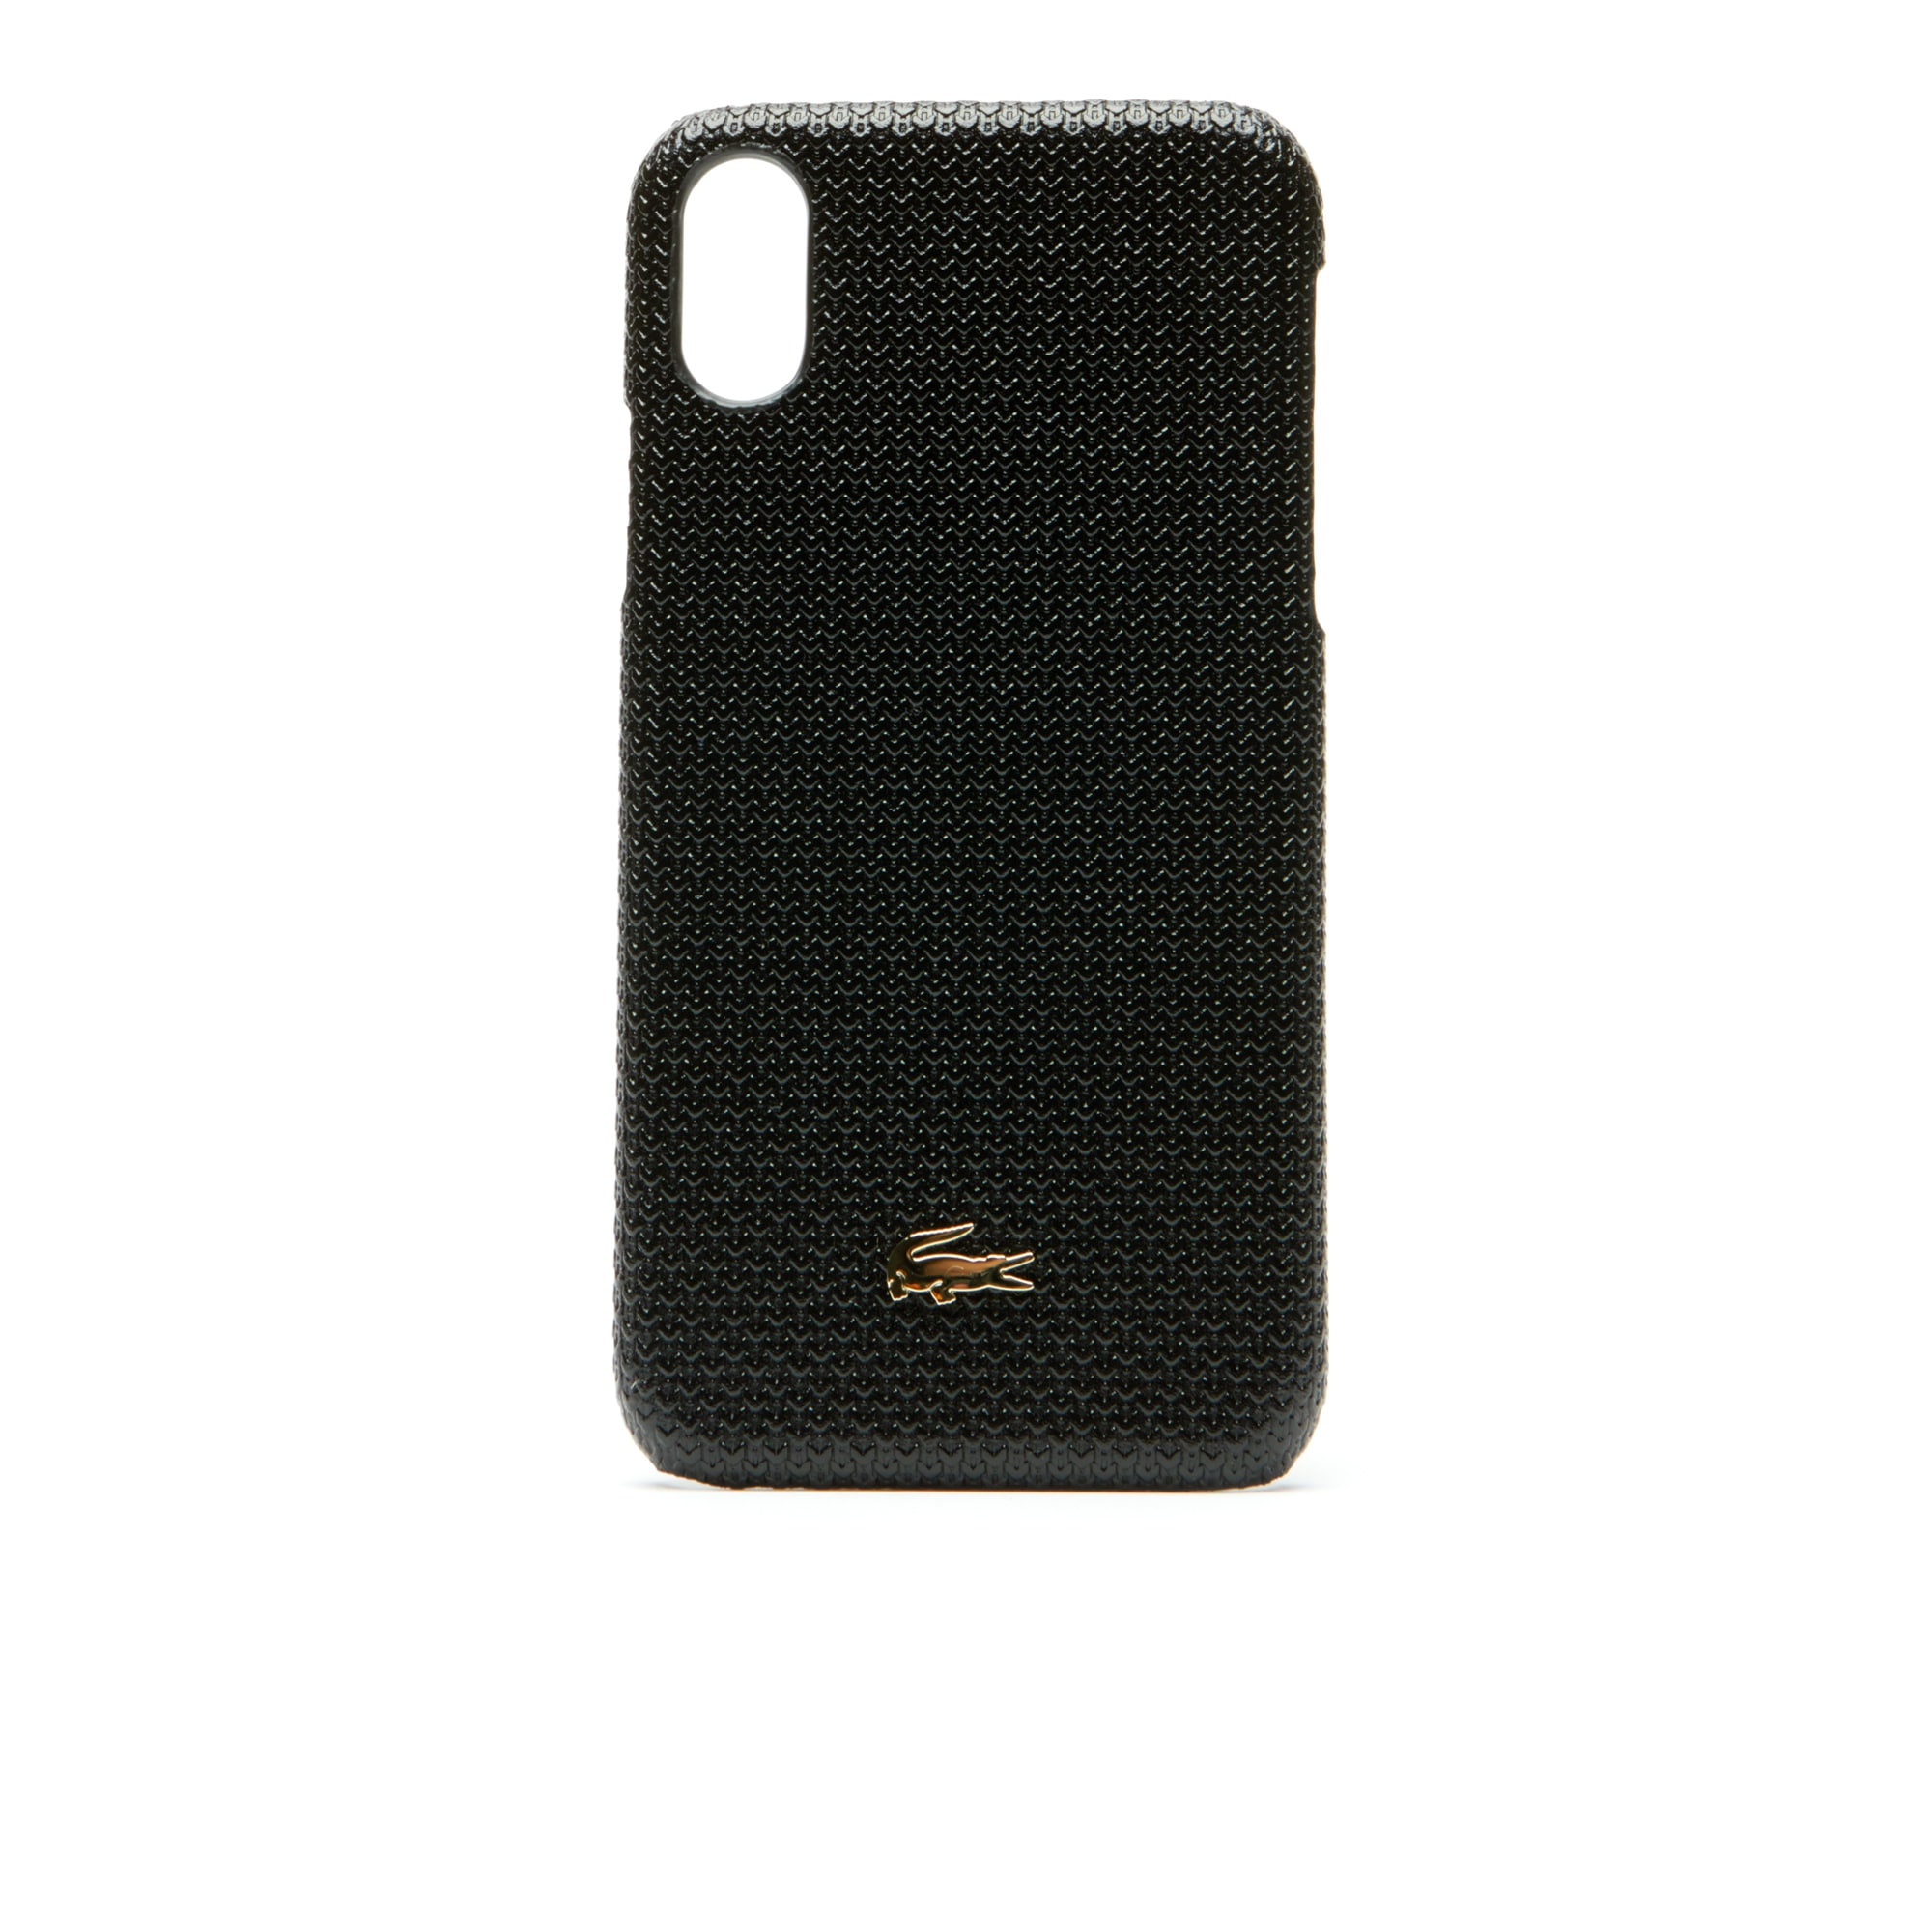 iPhone X-hoes Chantaco dames piquéleer